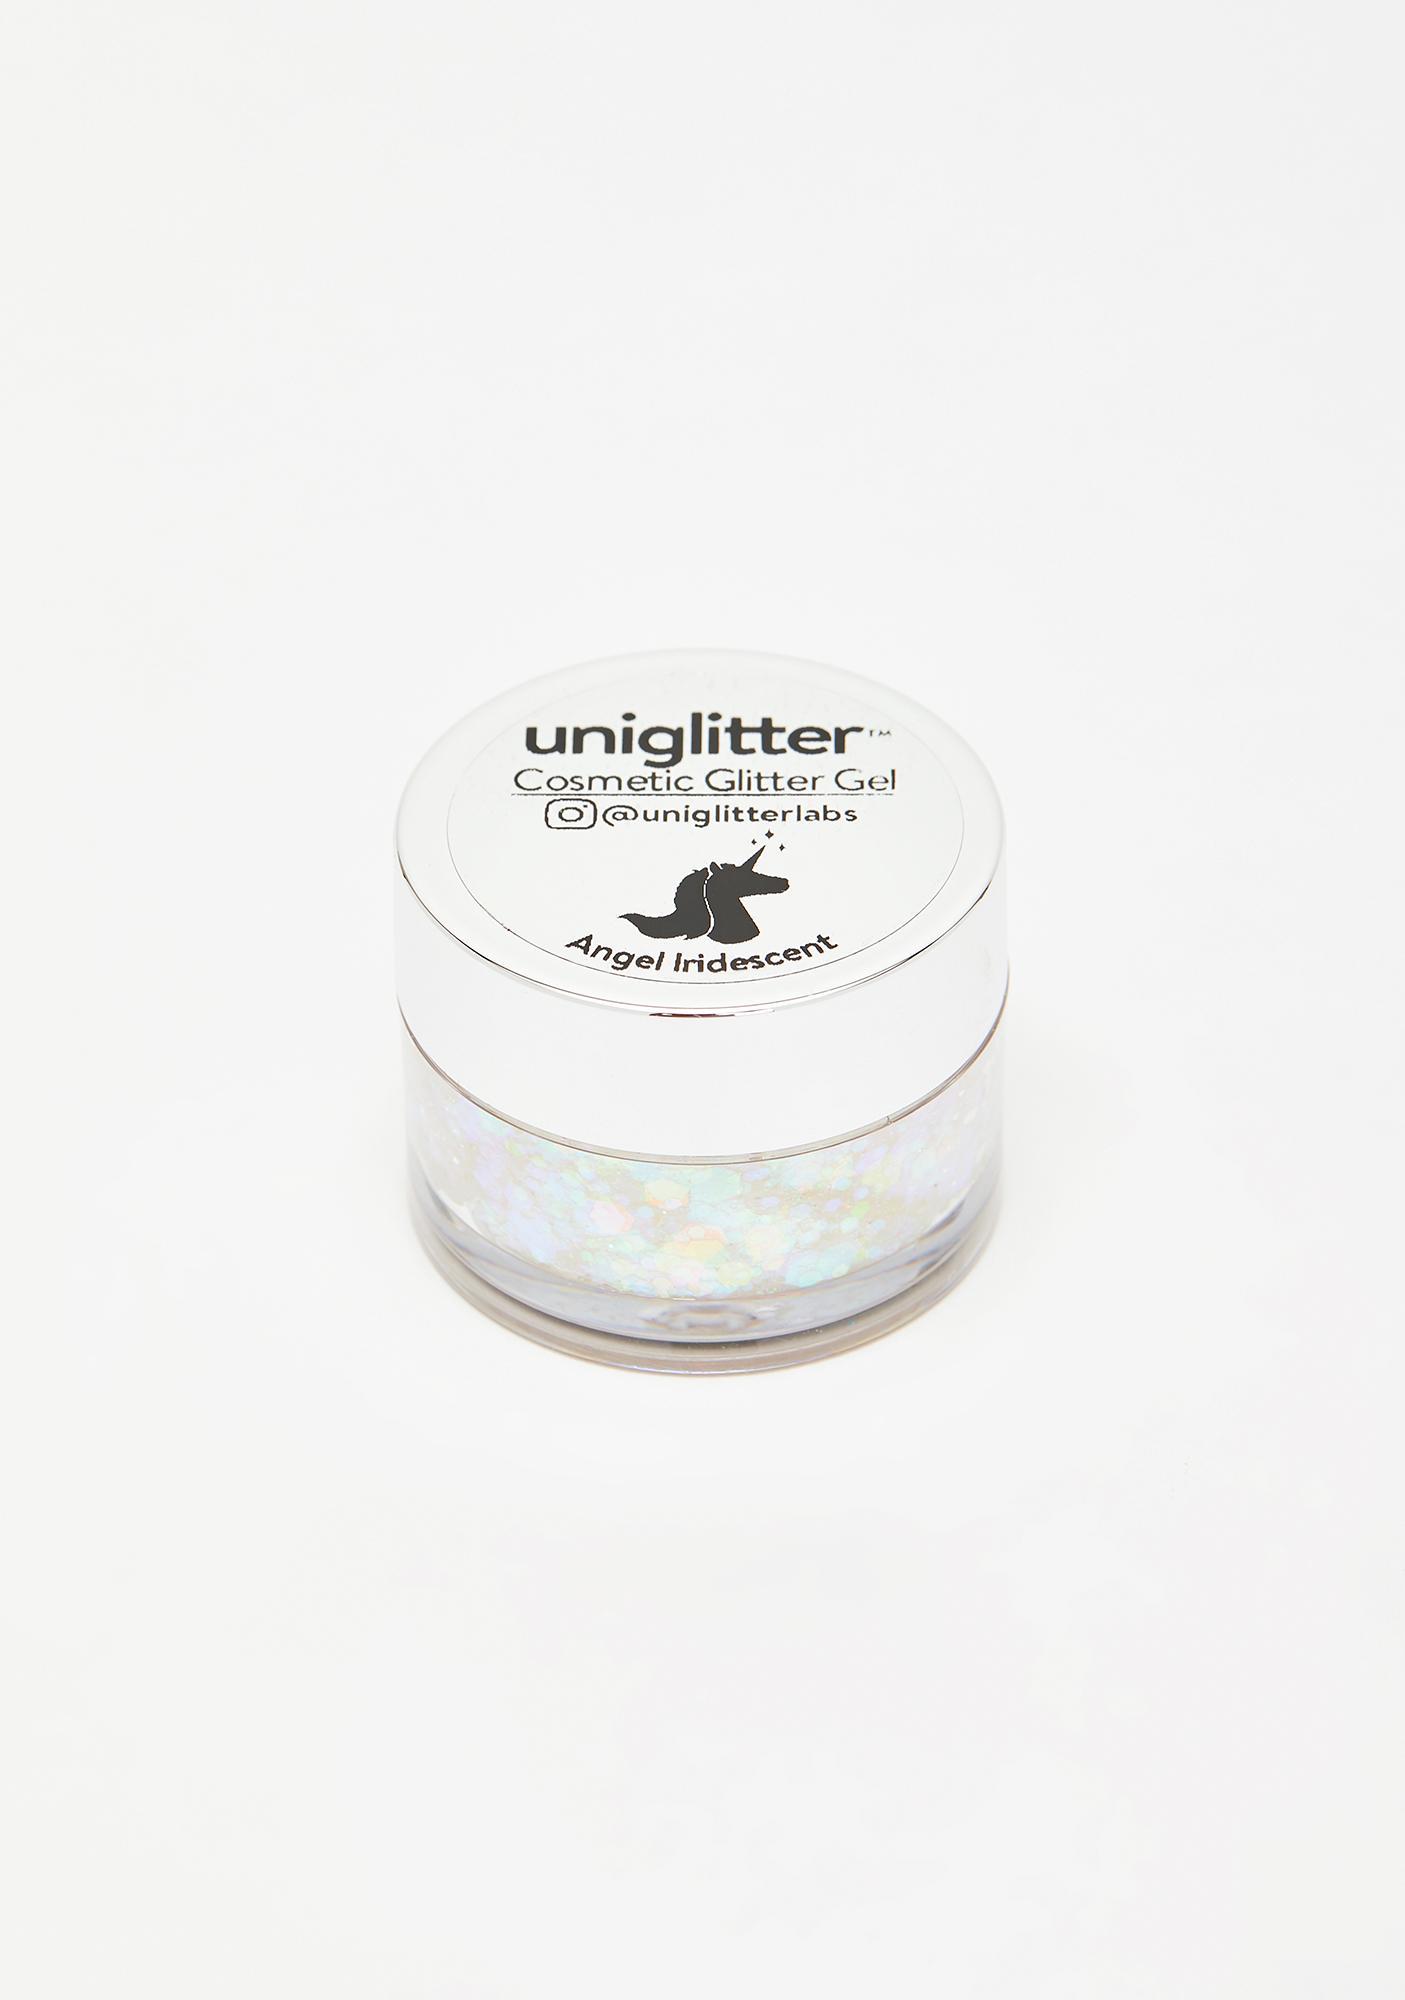 Uniglitter Iridescent Angel Glitter Gel